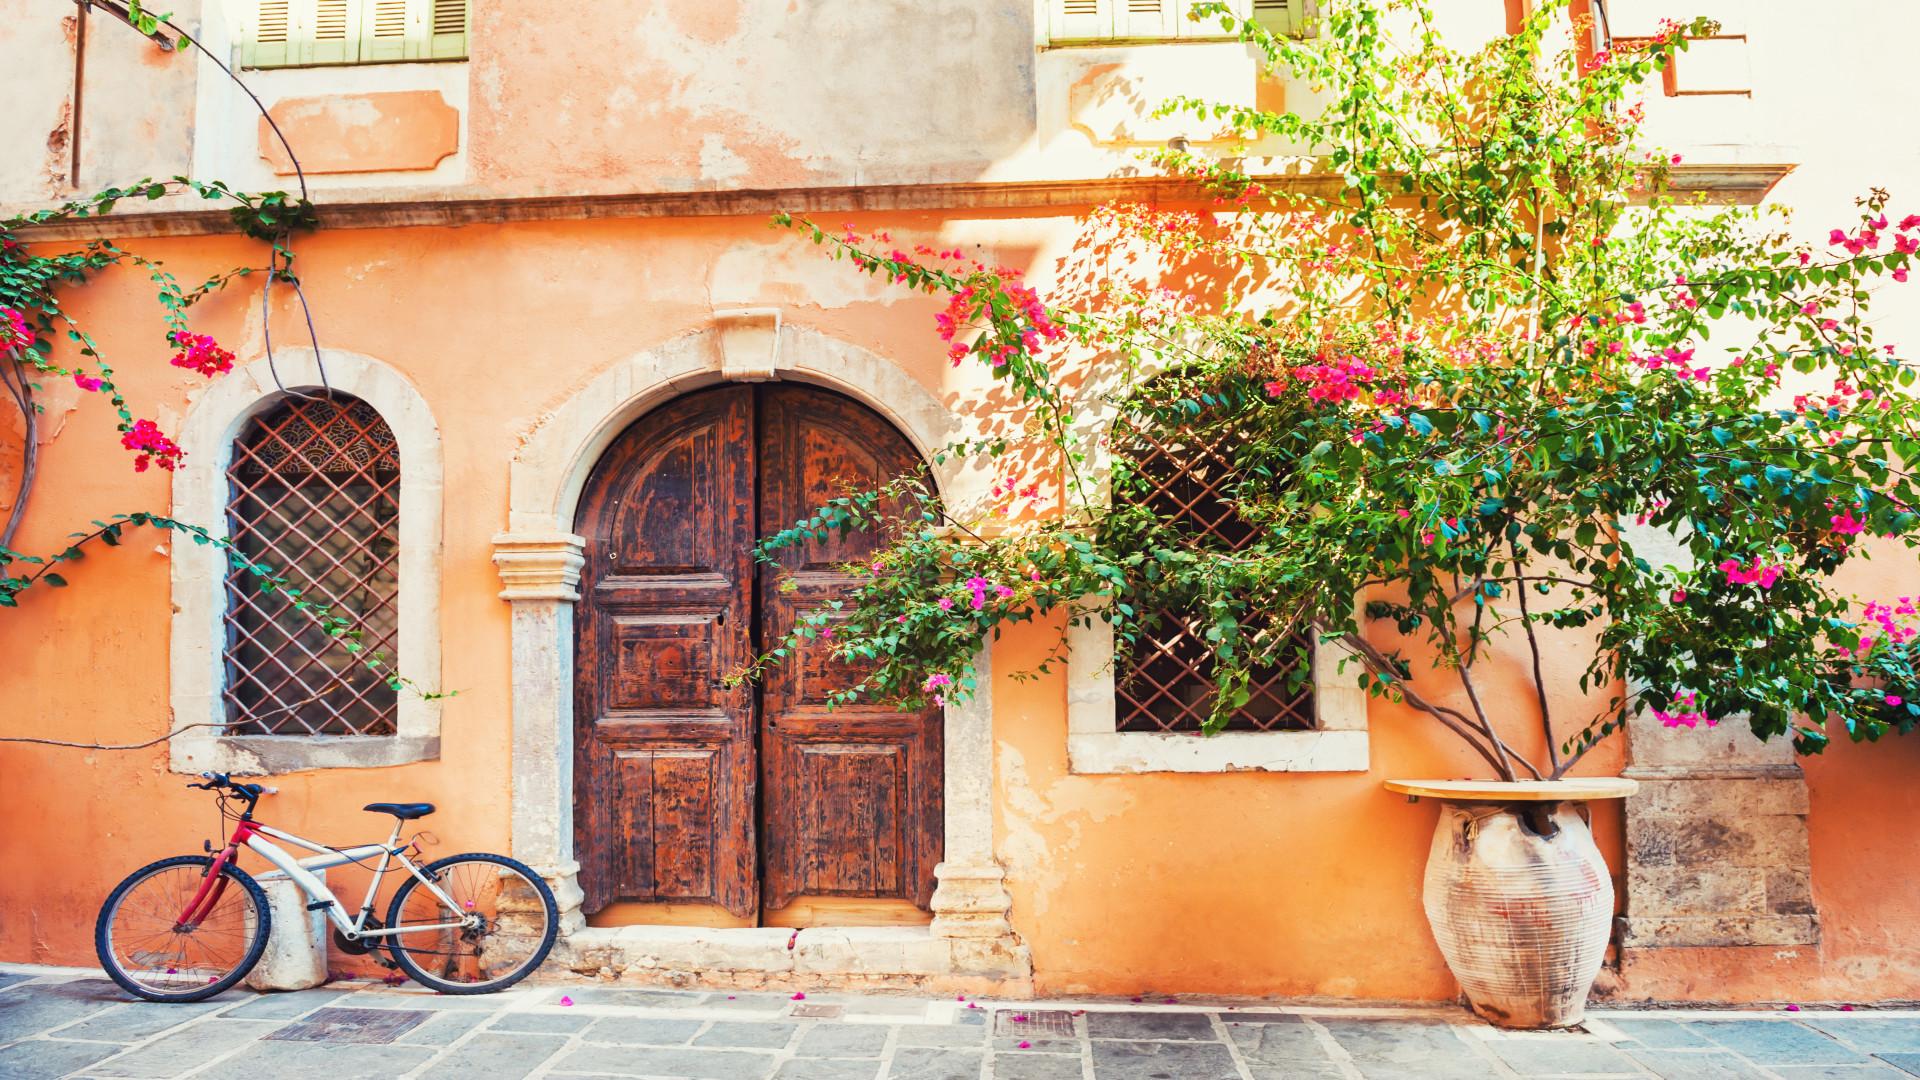 Mooi oud gebouw met fiets en grote plant in Chania, Kreta, Griekenland